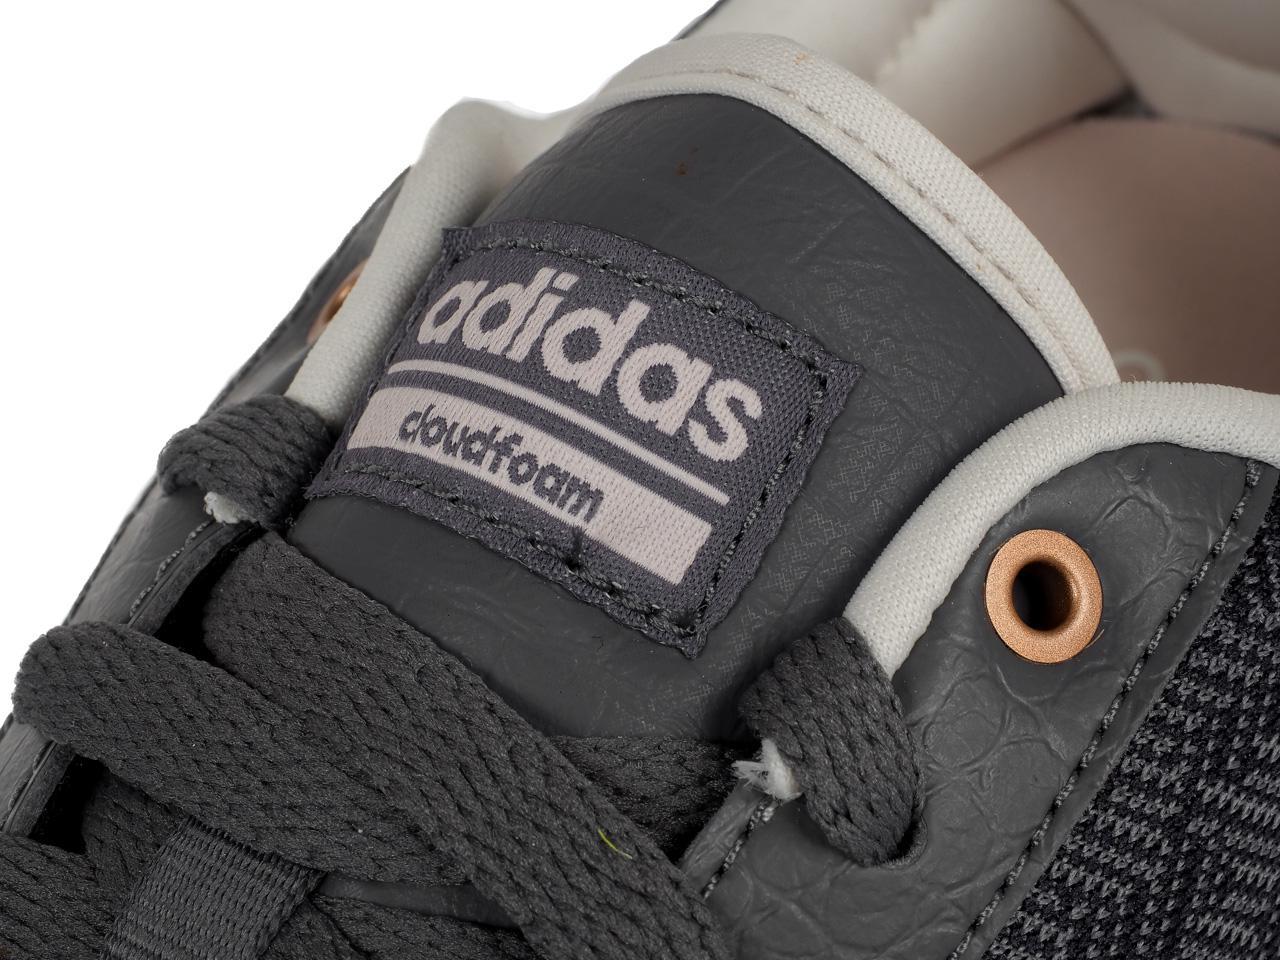 CHAUSSURES MODE VILLE Adidas neo Cf daily qt cl w imp Gris